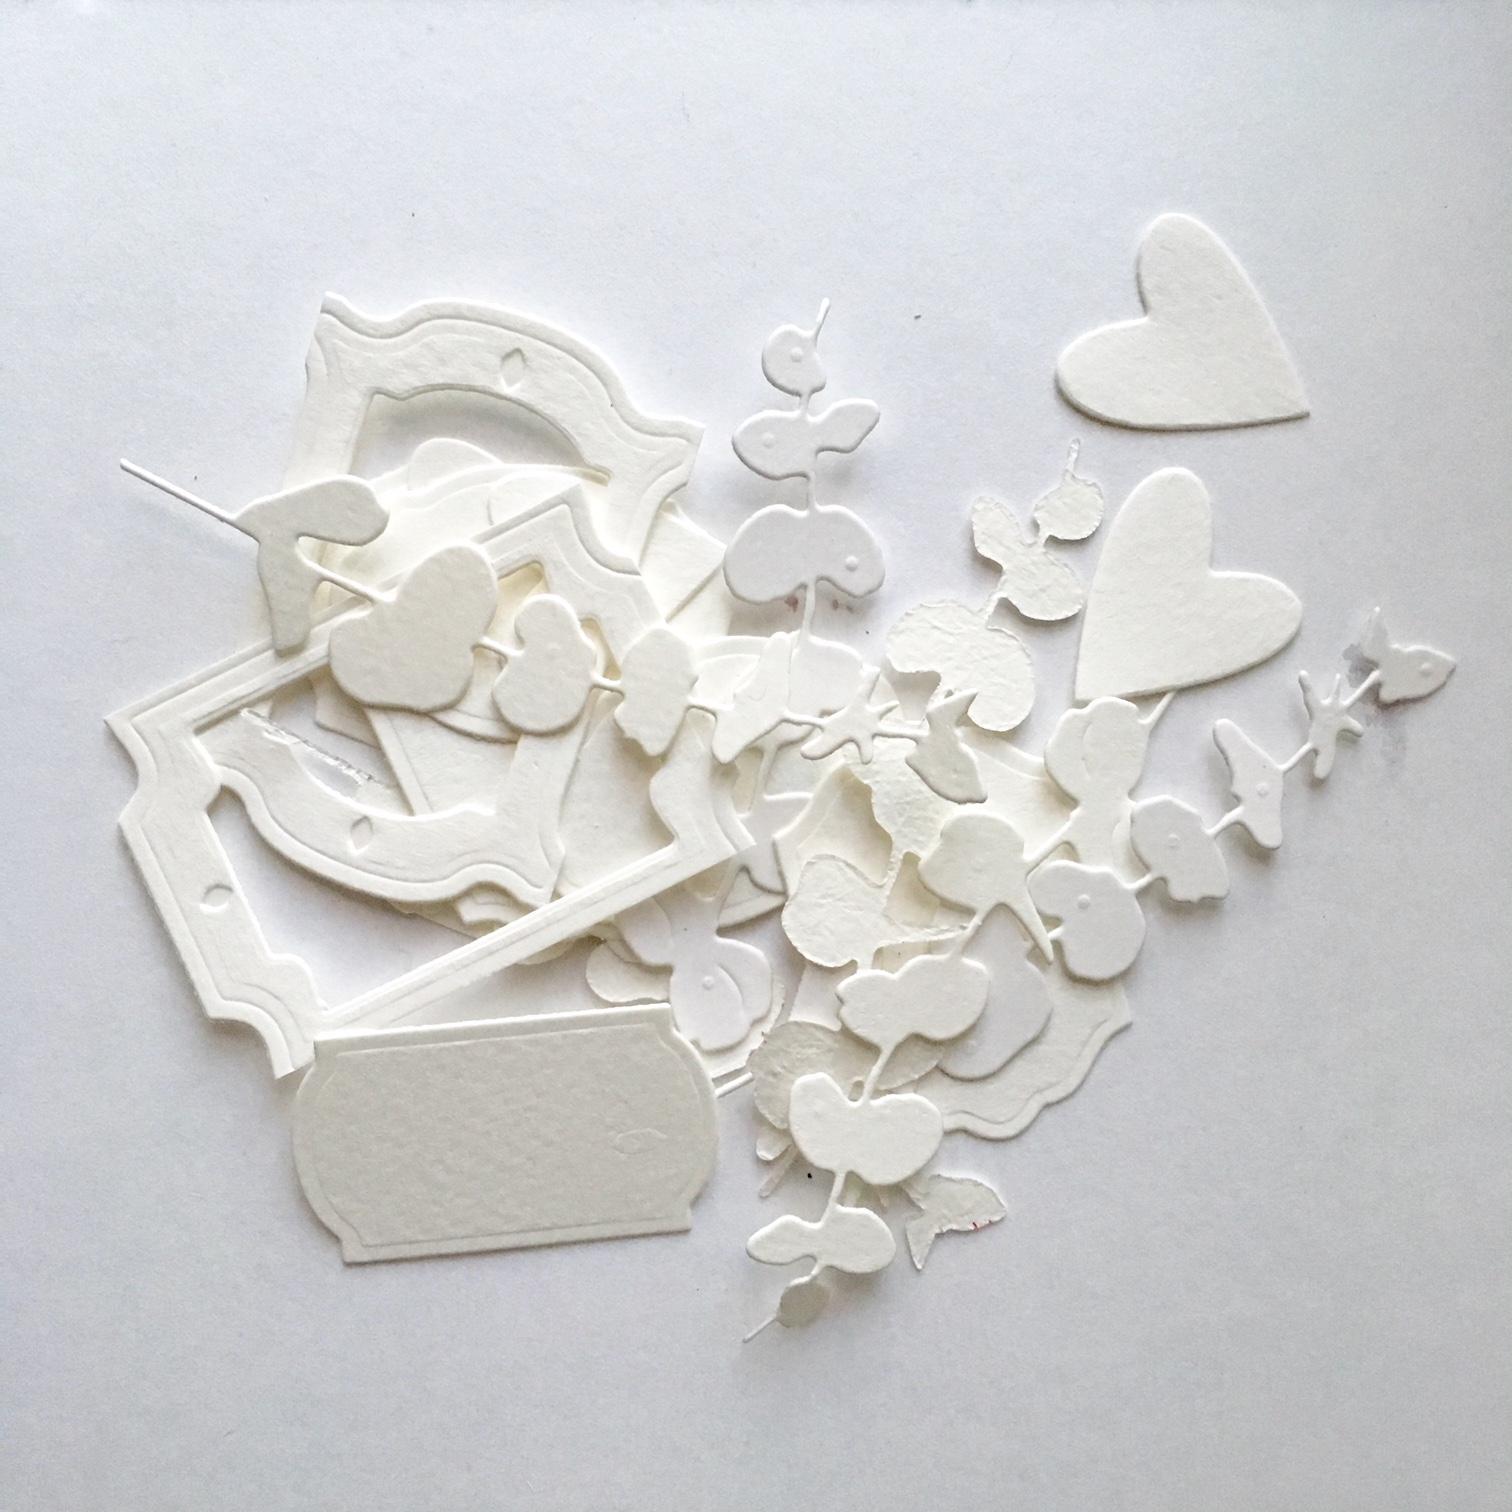 little paper elements cut using Sizzix Big shot machine